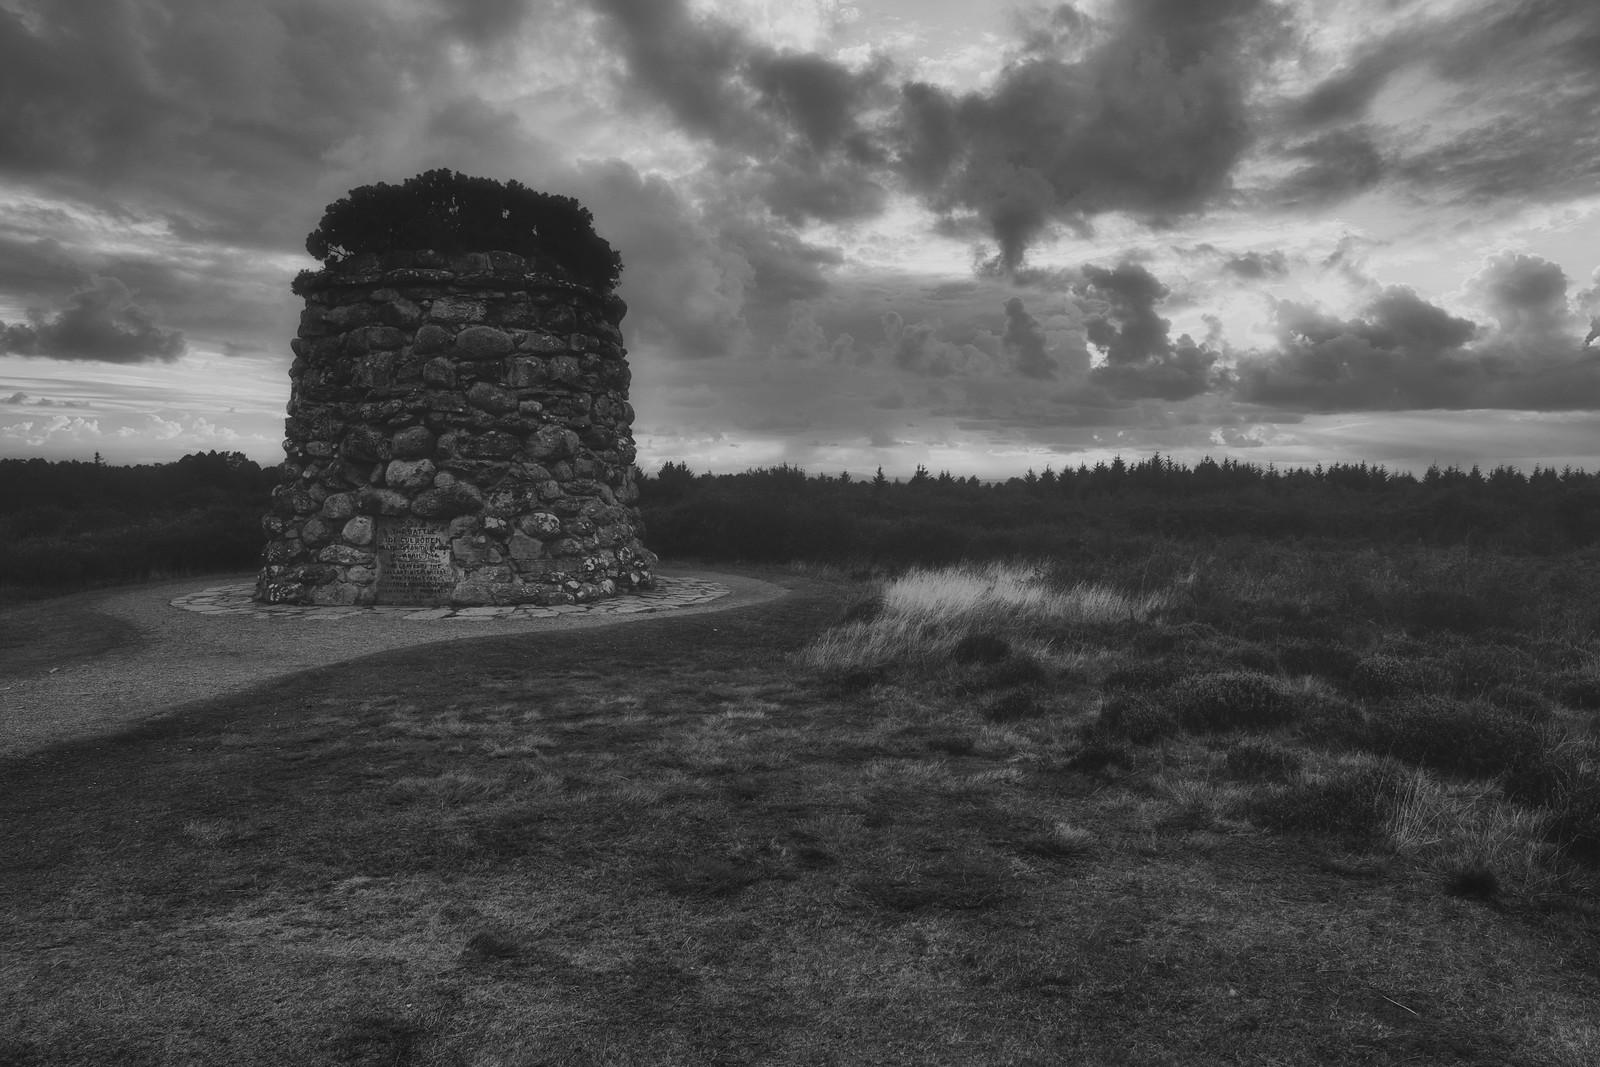 Through the Mist on Culloden Moor